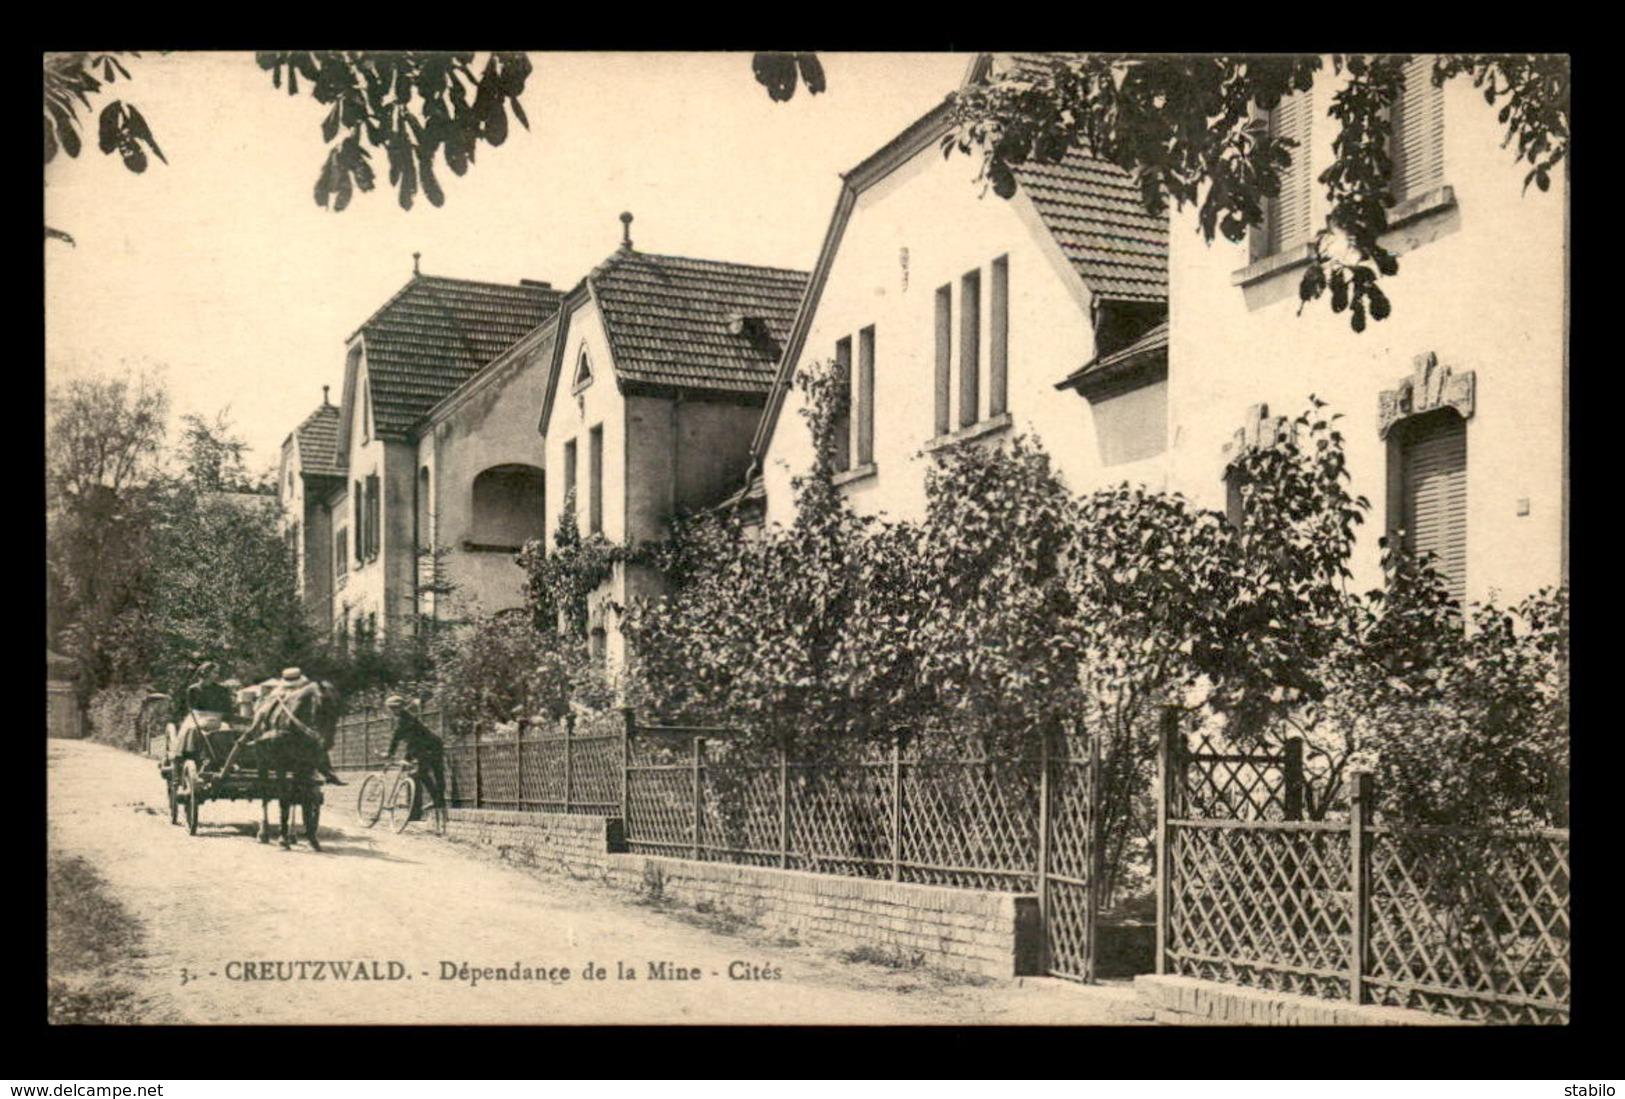 57 - CREUTZWALD - DEPENDANCE DE LA MINE - LES CITES - Creutzwald